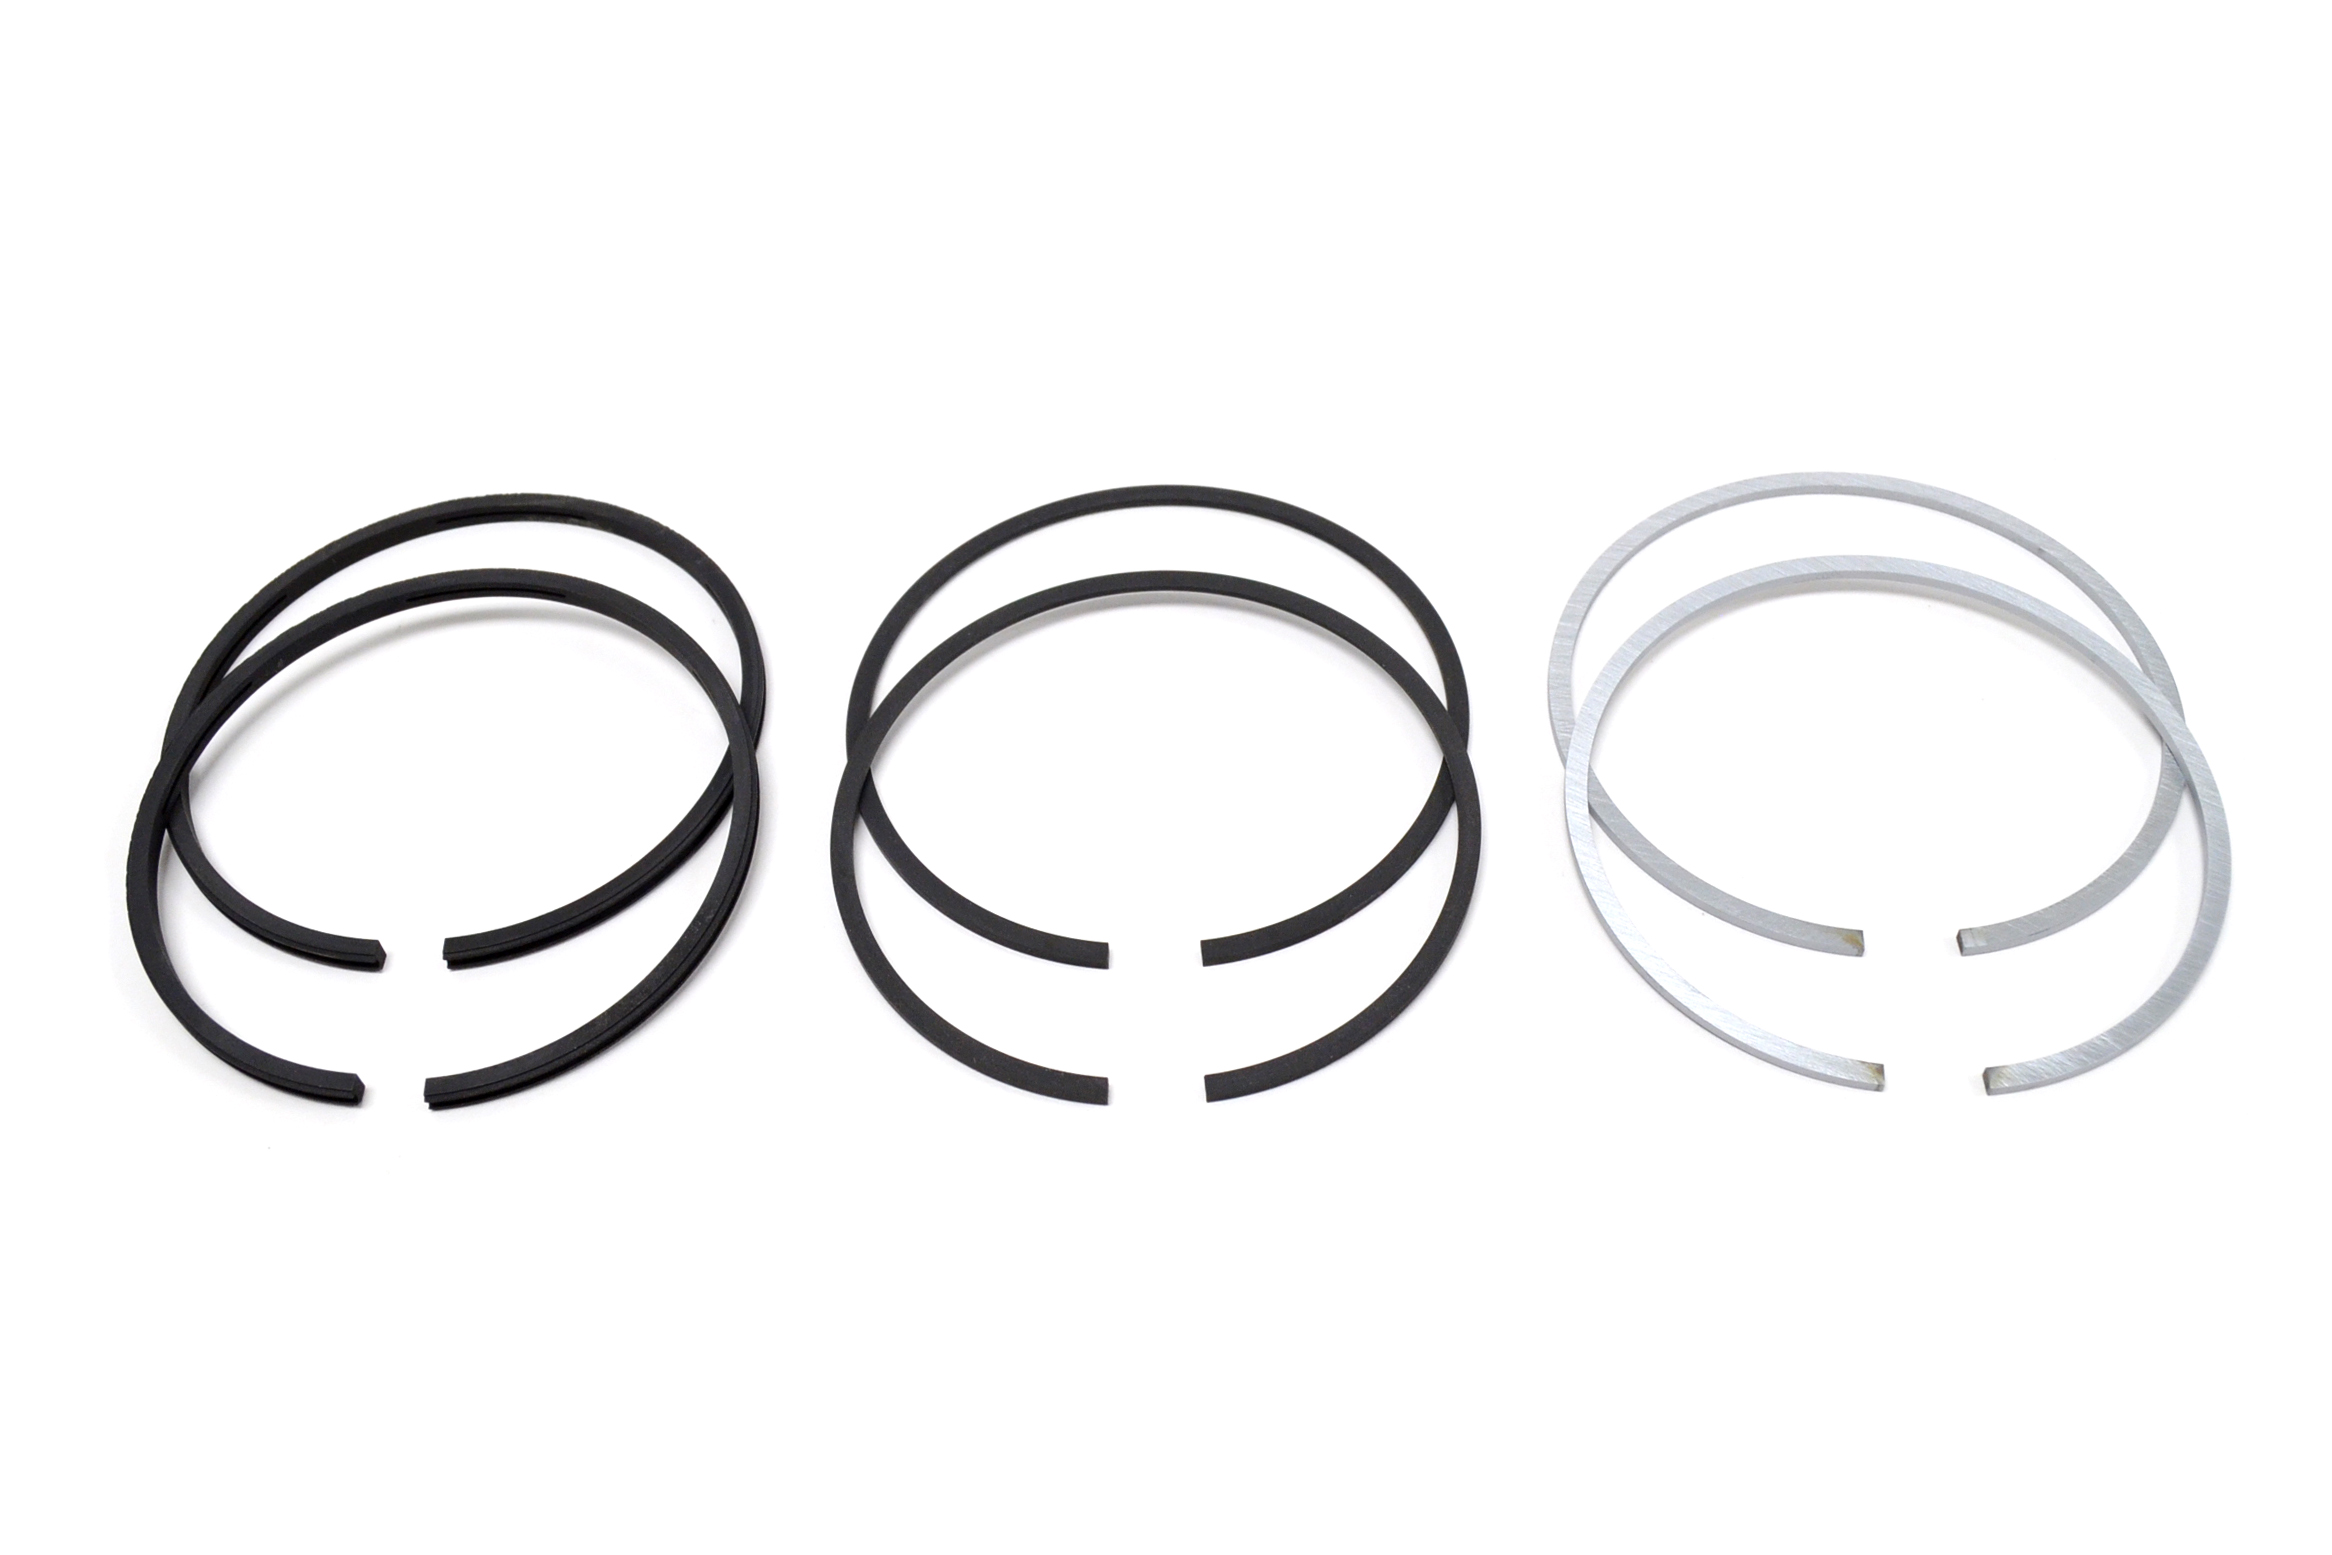 Triumph 500cc High Quality Usa Made Ring Set Standard